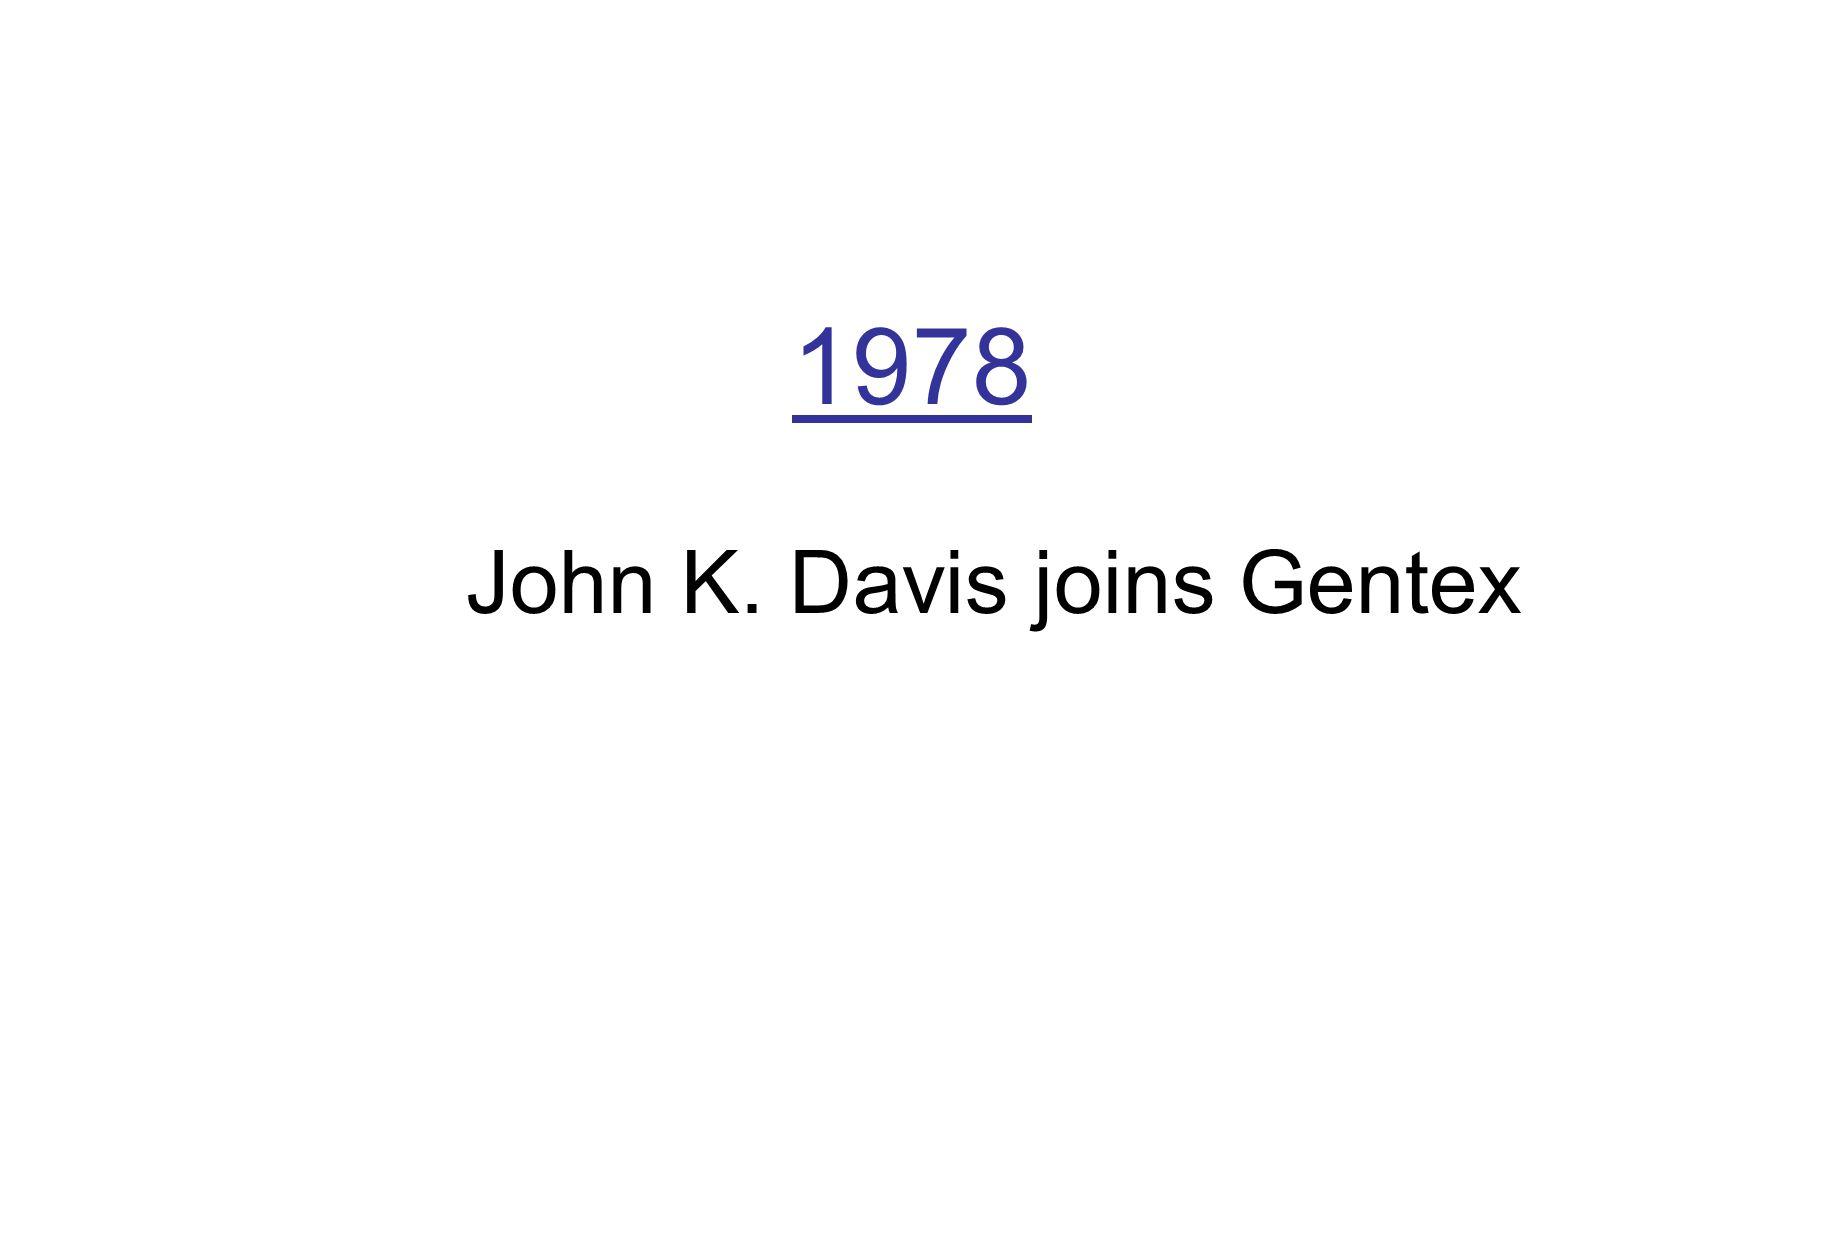 1978 John K. Davis joins Gentex